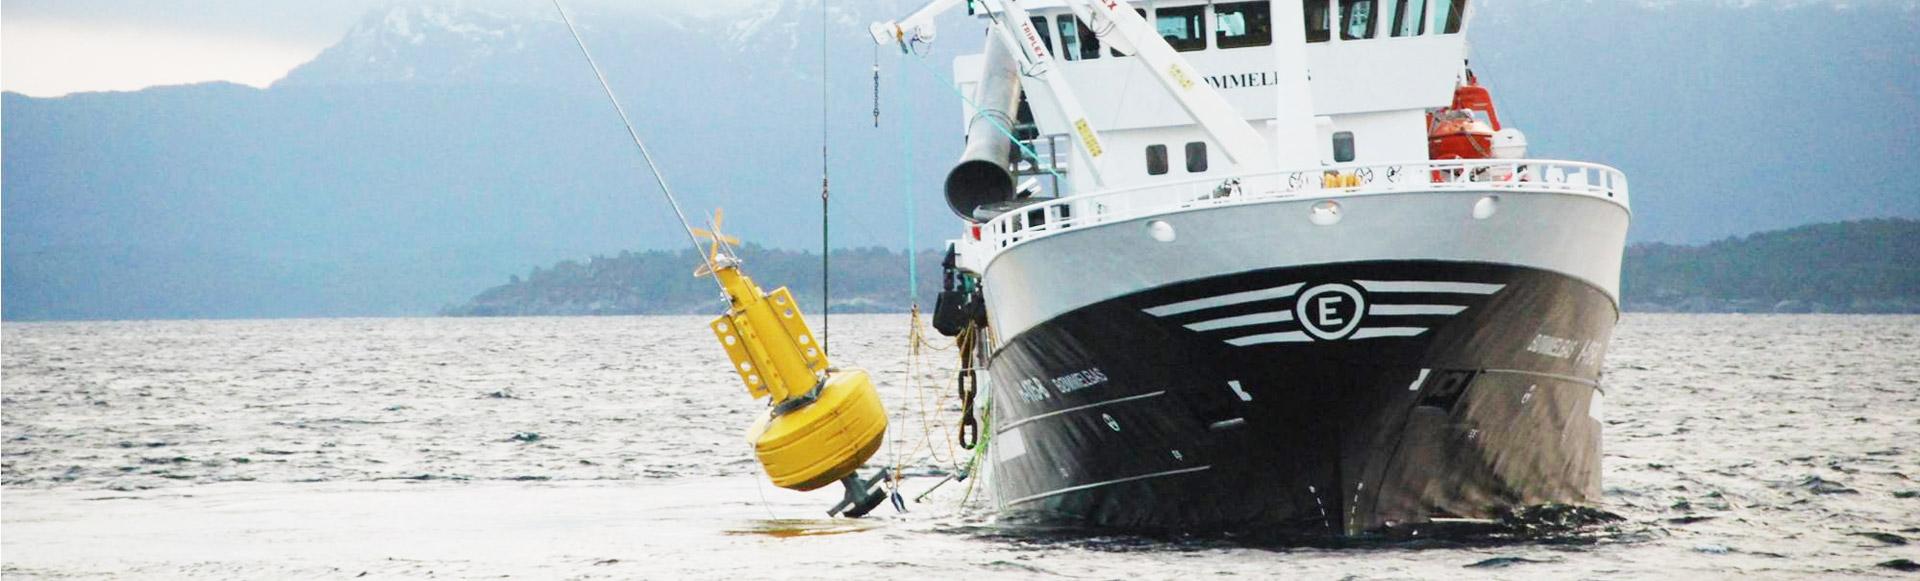 Maritim Consult fra Dynamics C5 til Uniconta